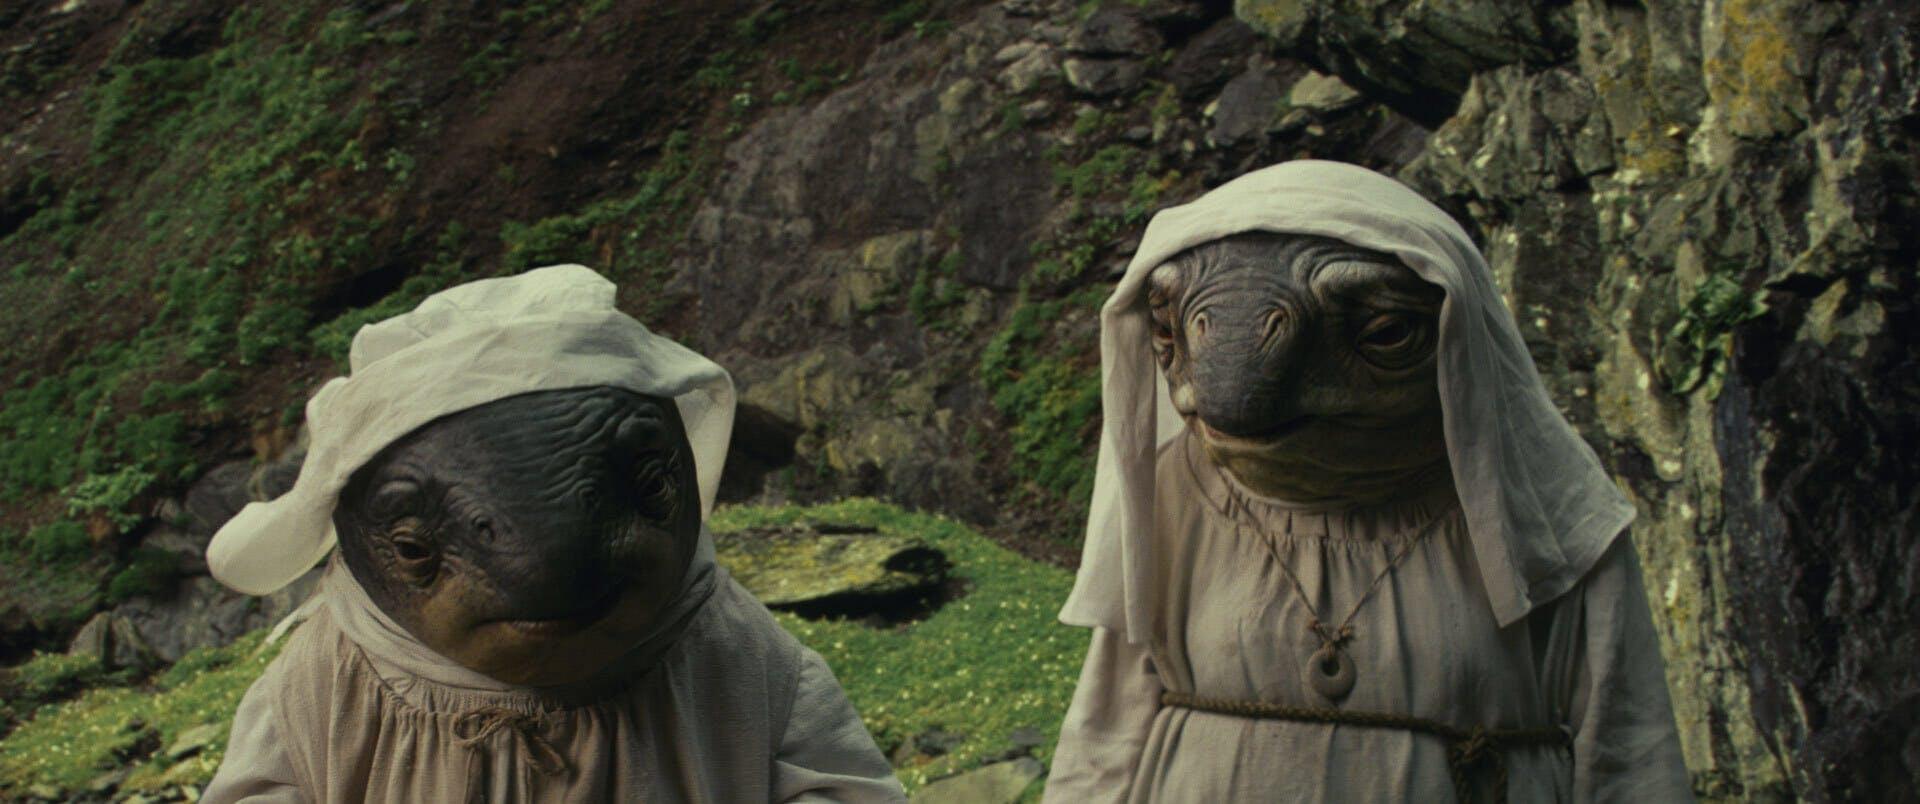 lanai caretakers last jedi